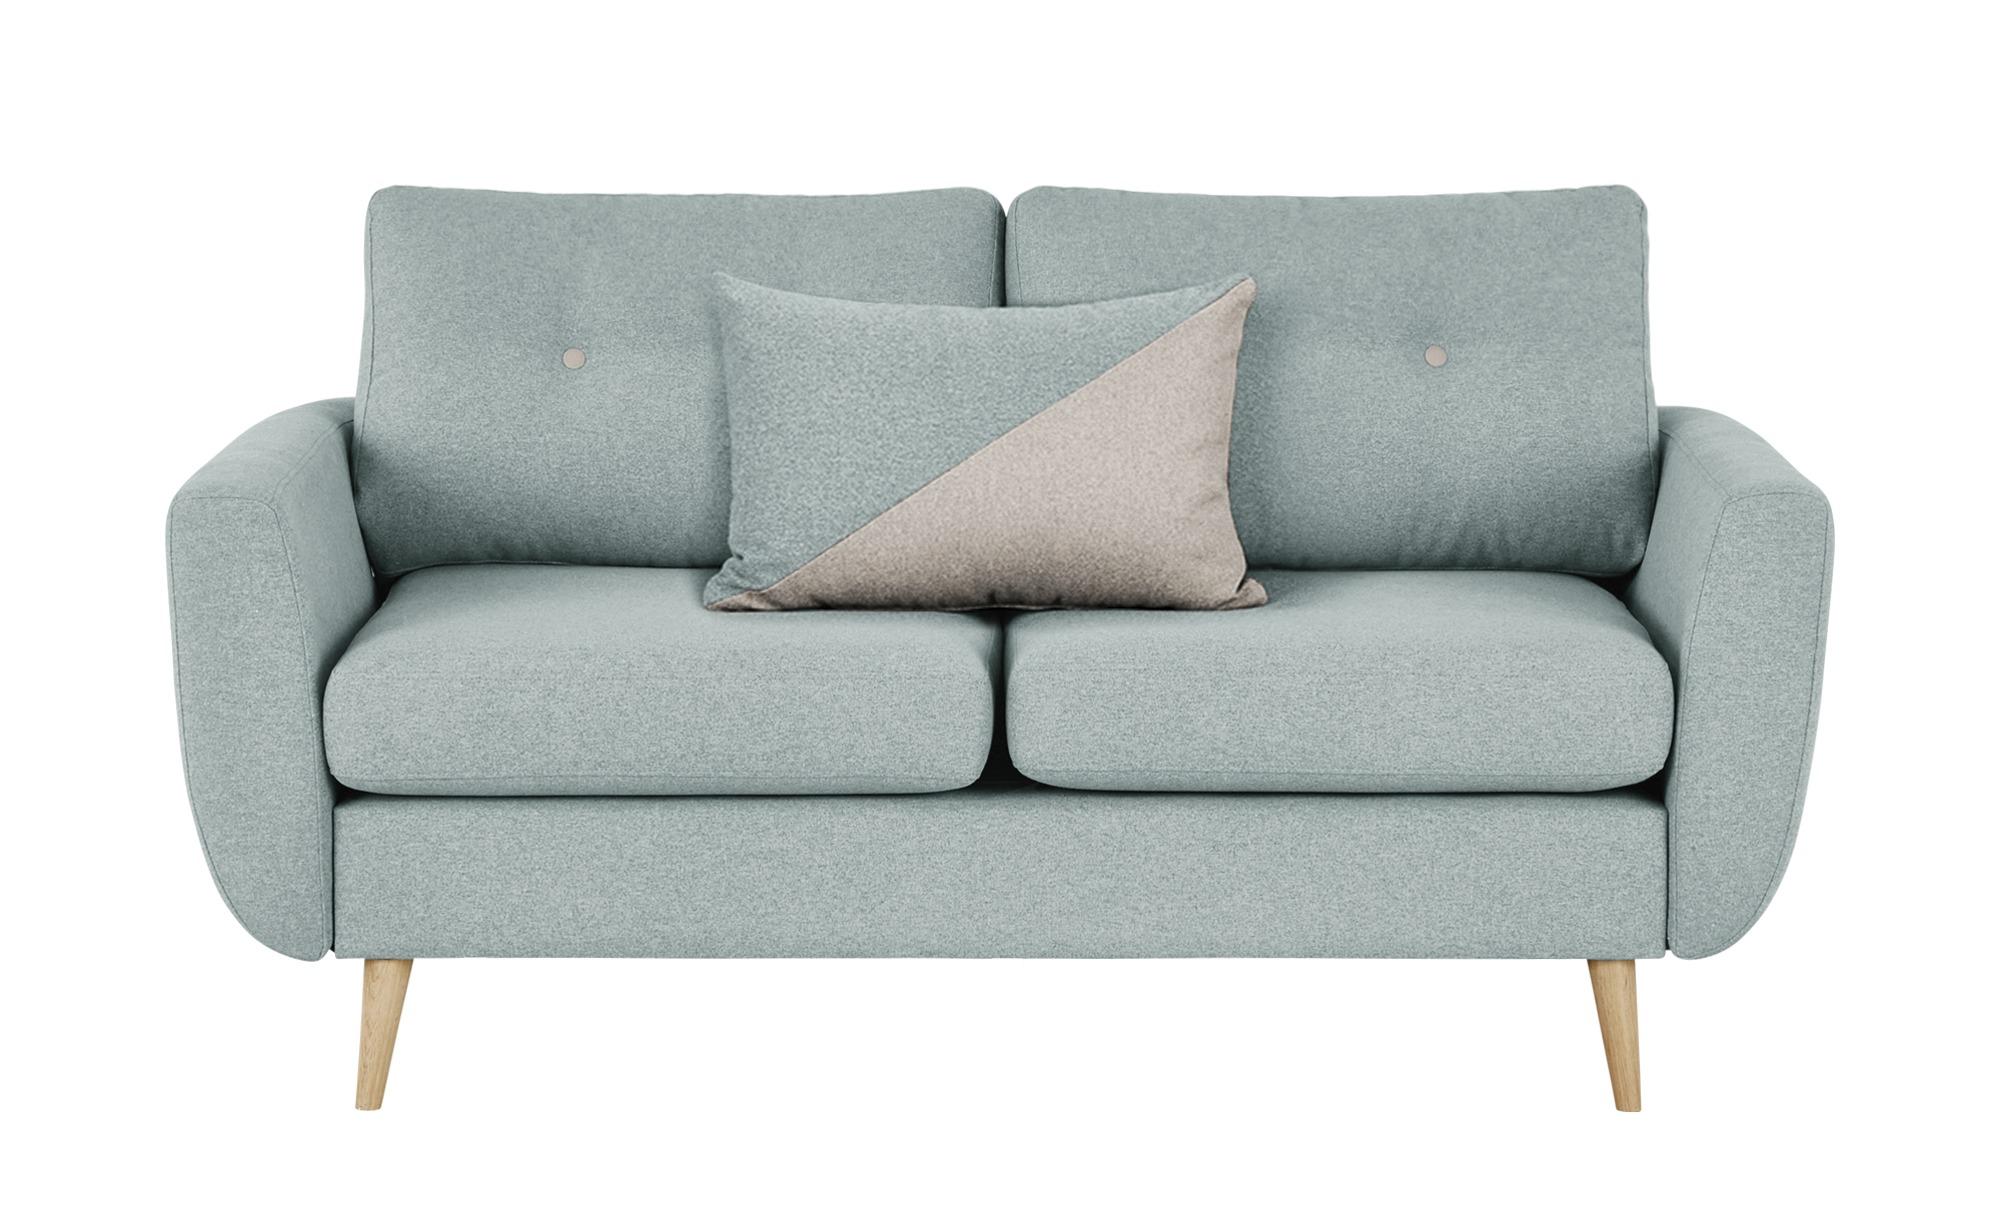 finya Sofa 2-sitzig mintgrün - Webstoff Harris ¦ grau ¦ Maße (cm): B: 161 H: 85 T: 92 Polstermöbel > Sofas > 2-Sitzer - Höffner